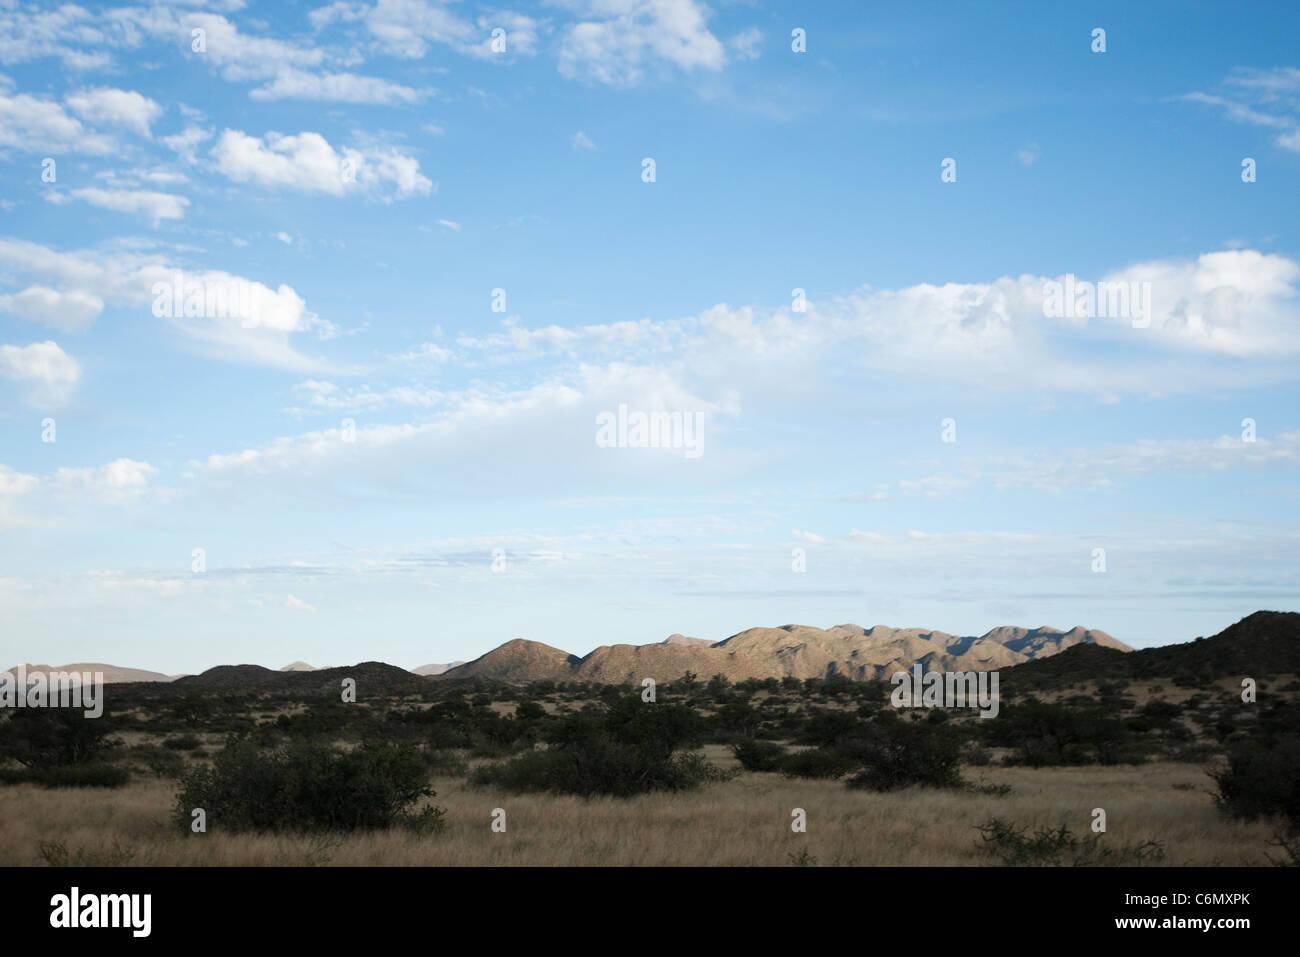 Koranaberg landscape with cloudy sky - Stock Image